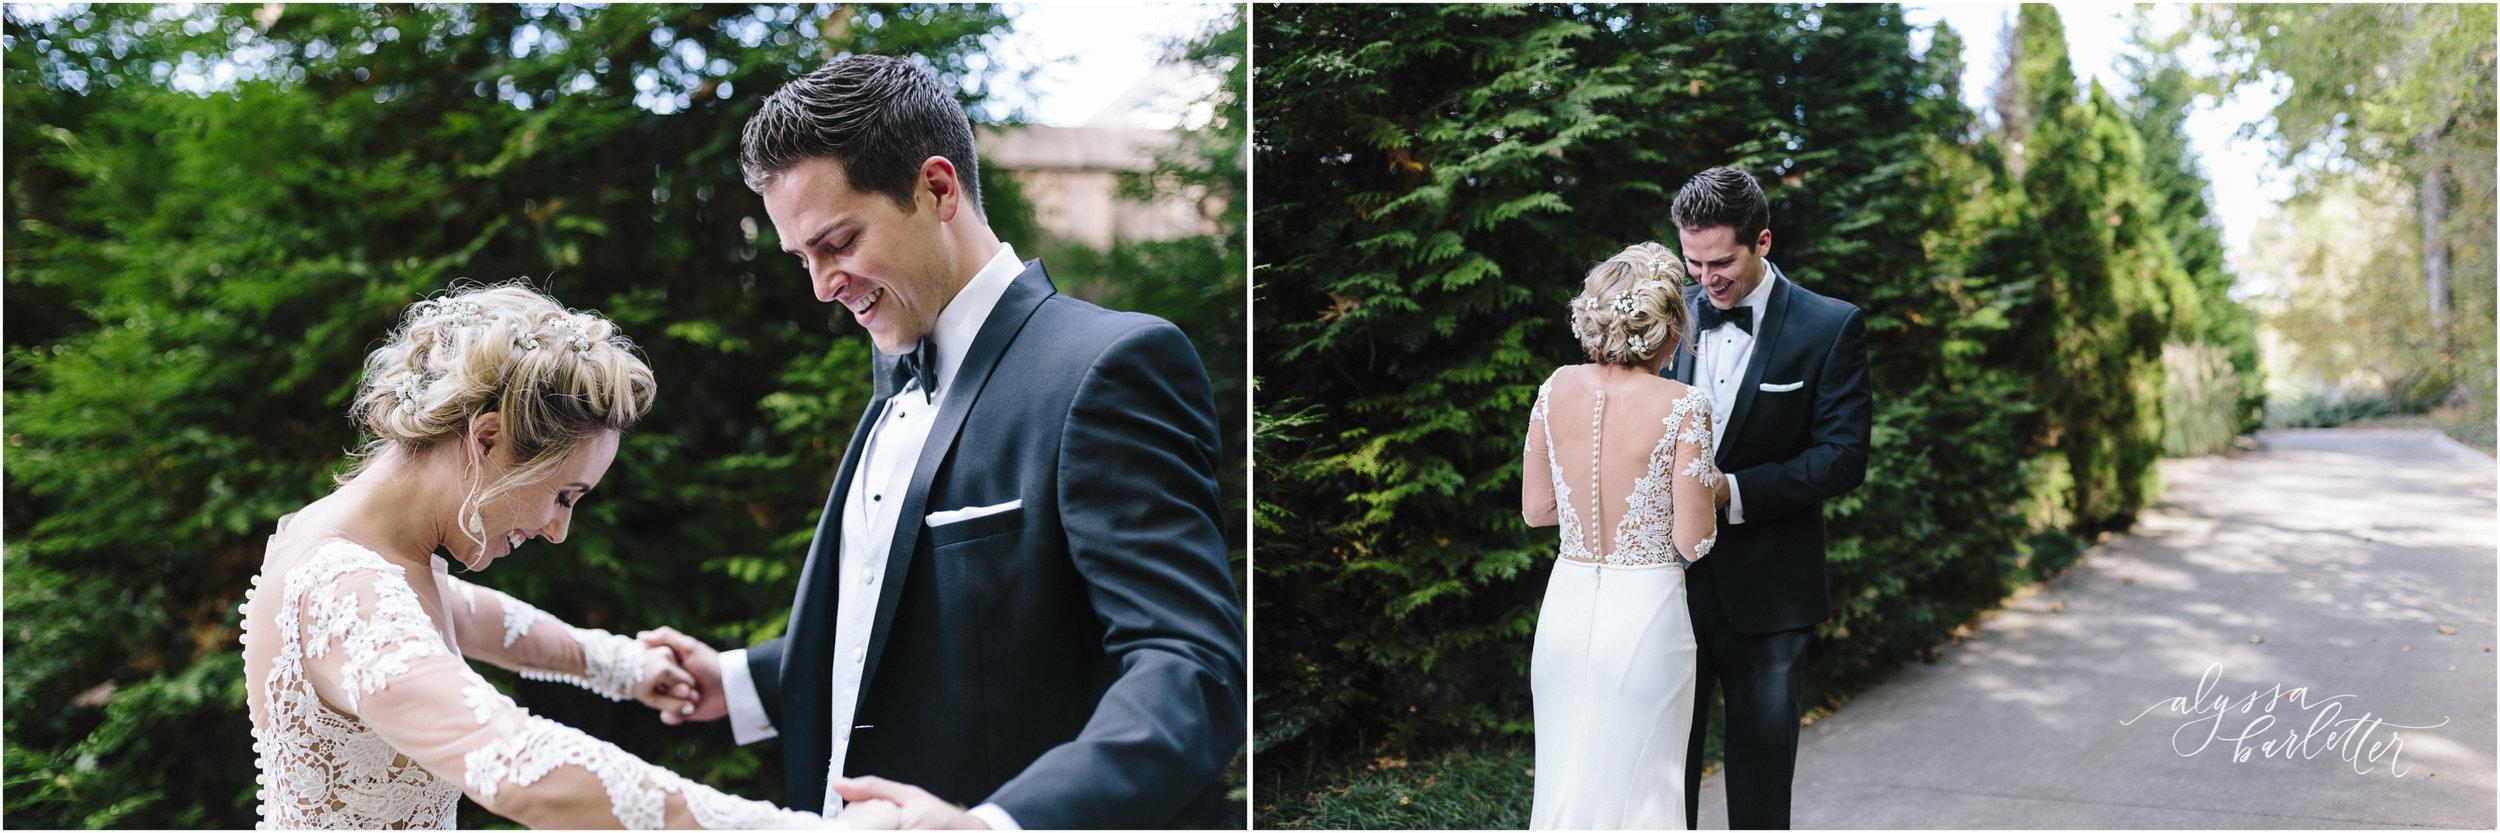 alyssa barletter photography fayetteville arkansas wedding photos micah and colin-1-21.jpg